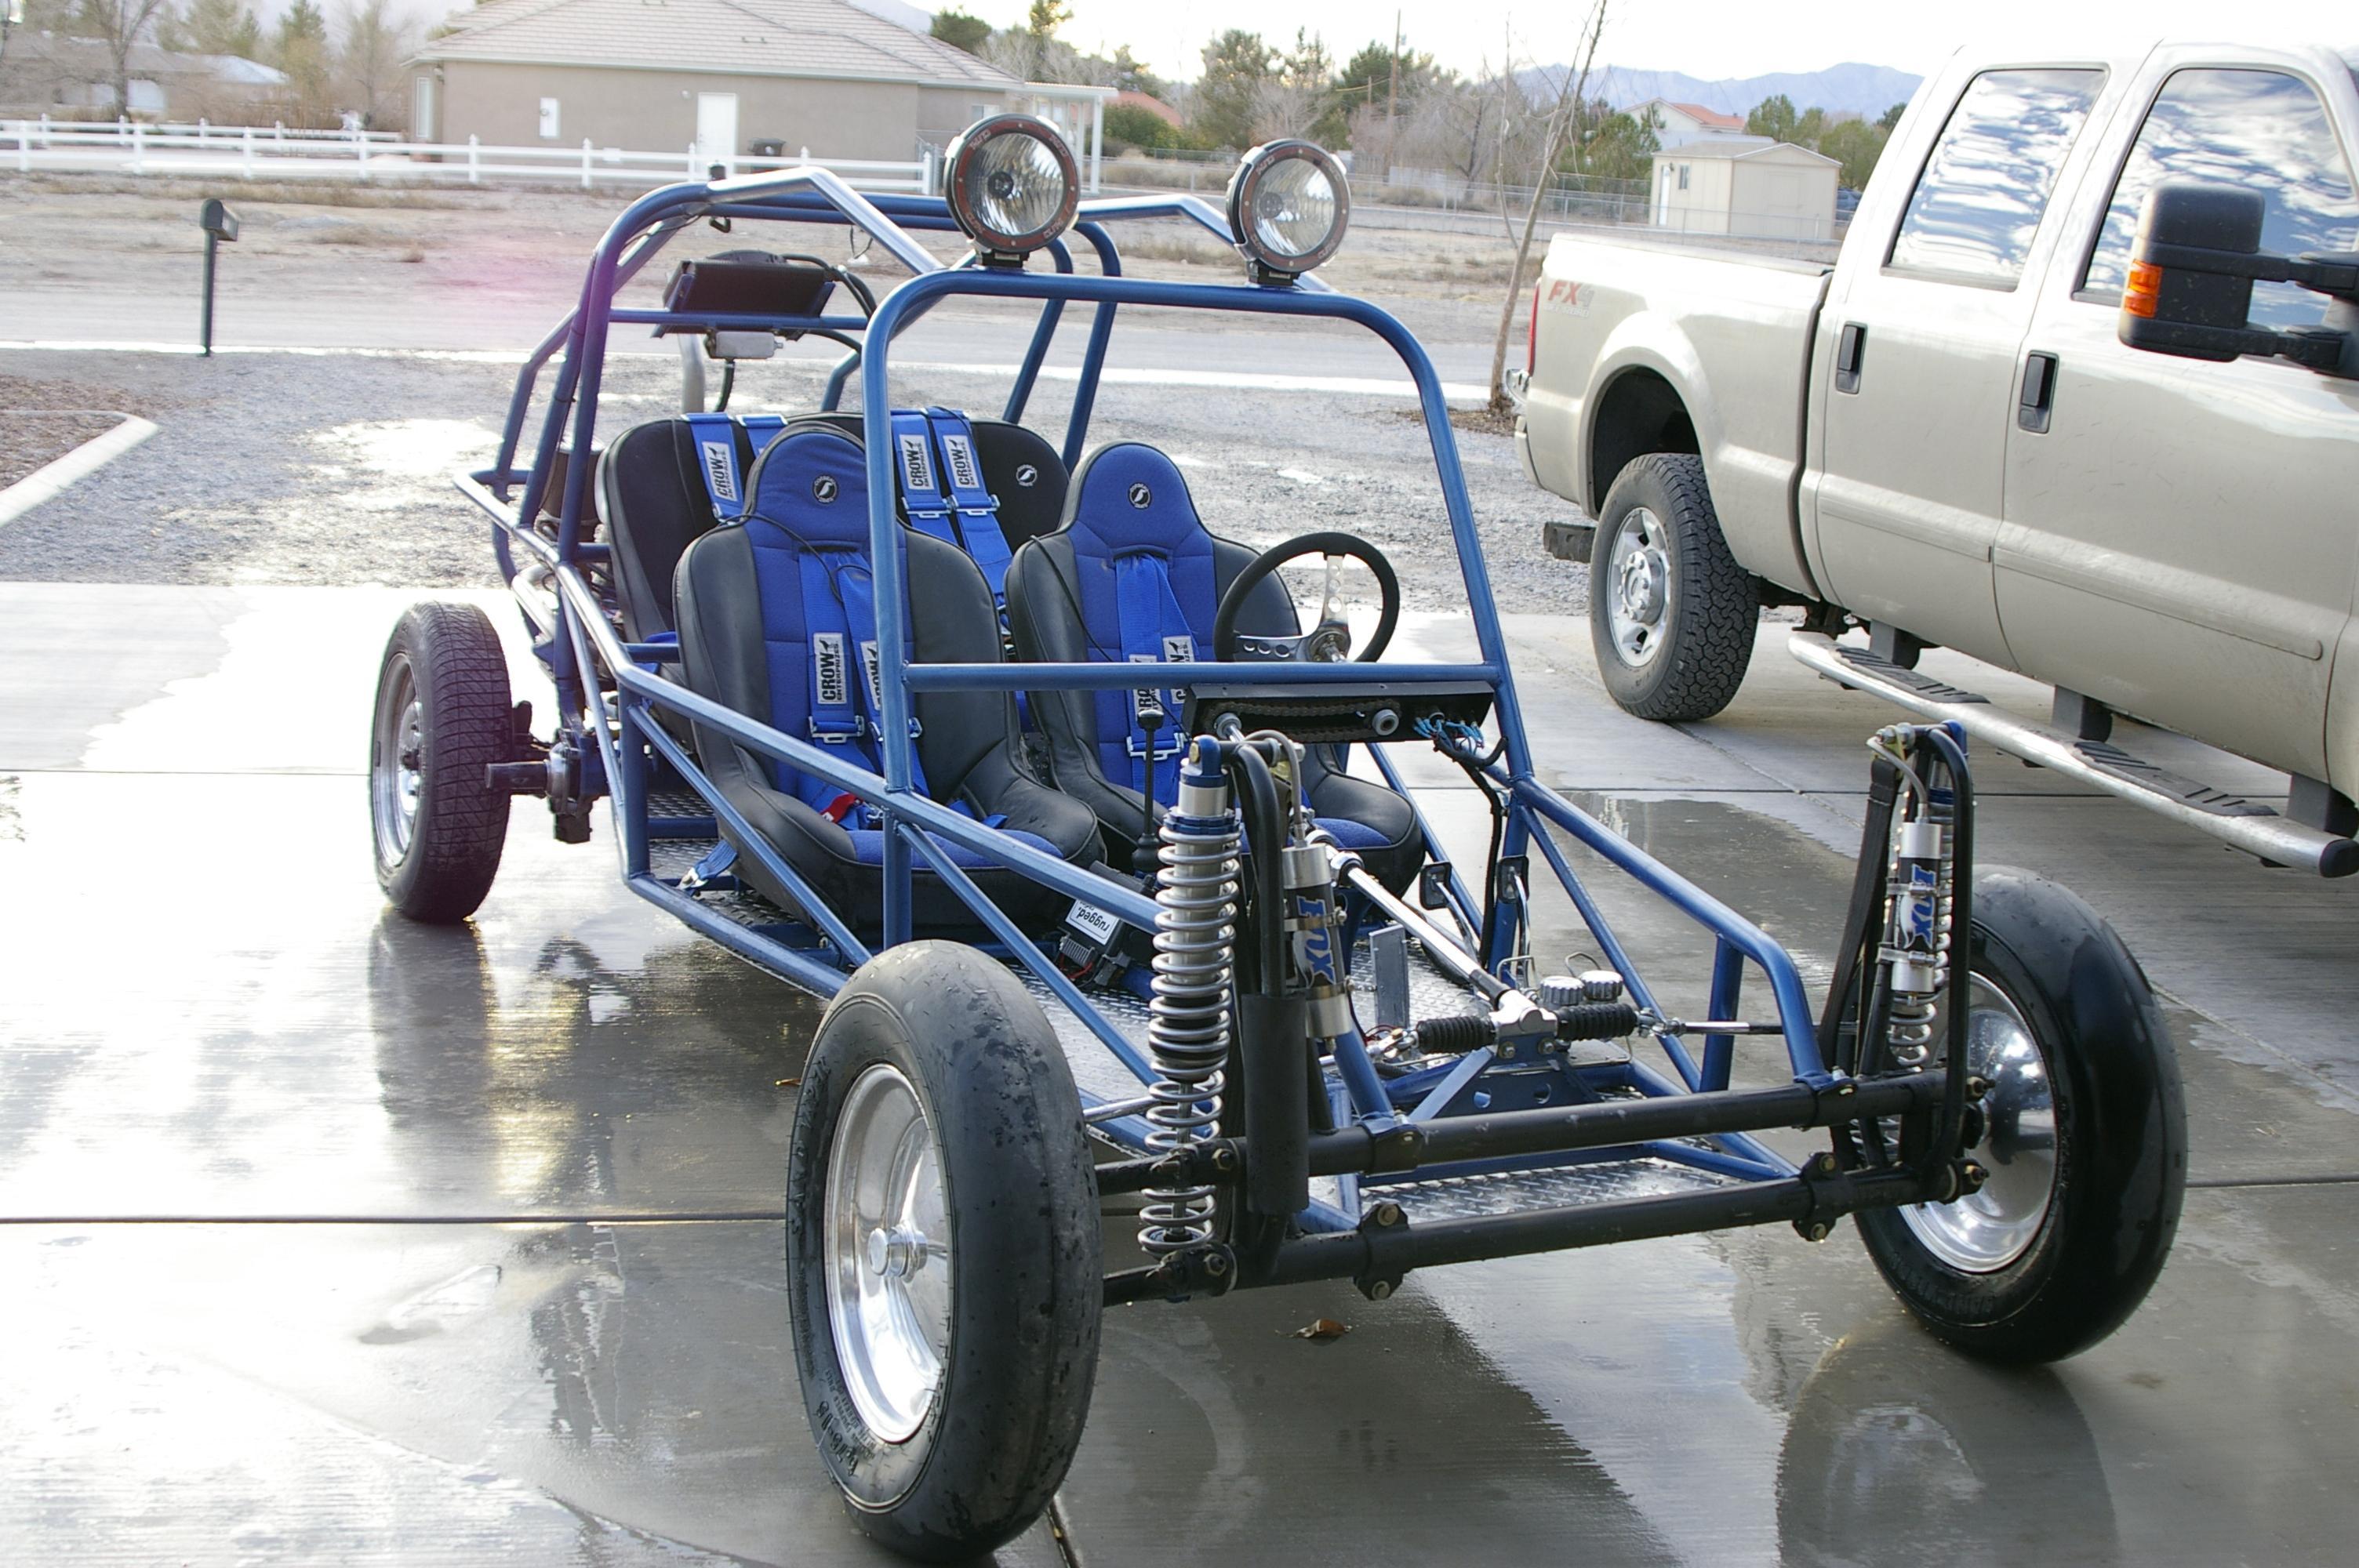 Vw Powered 4 seat sand rail - Sandrails for sale - Dumont